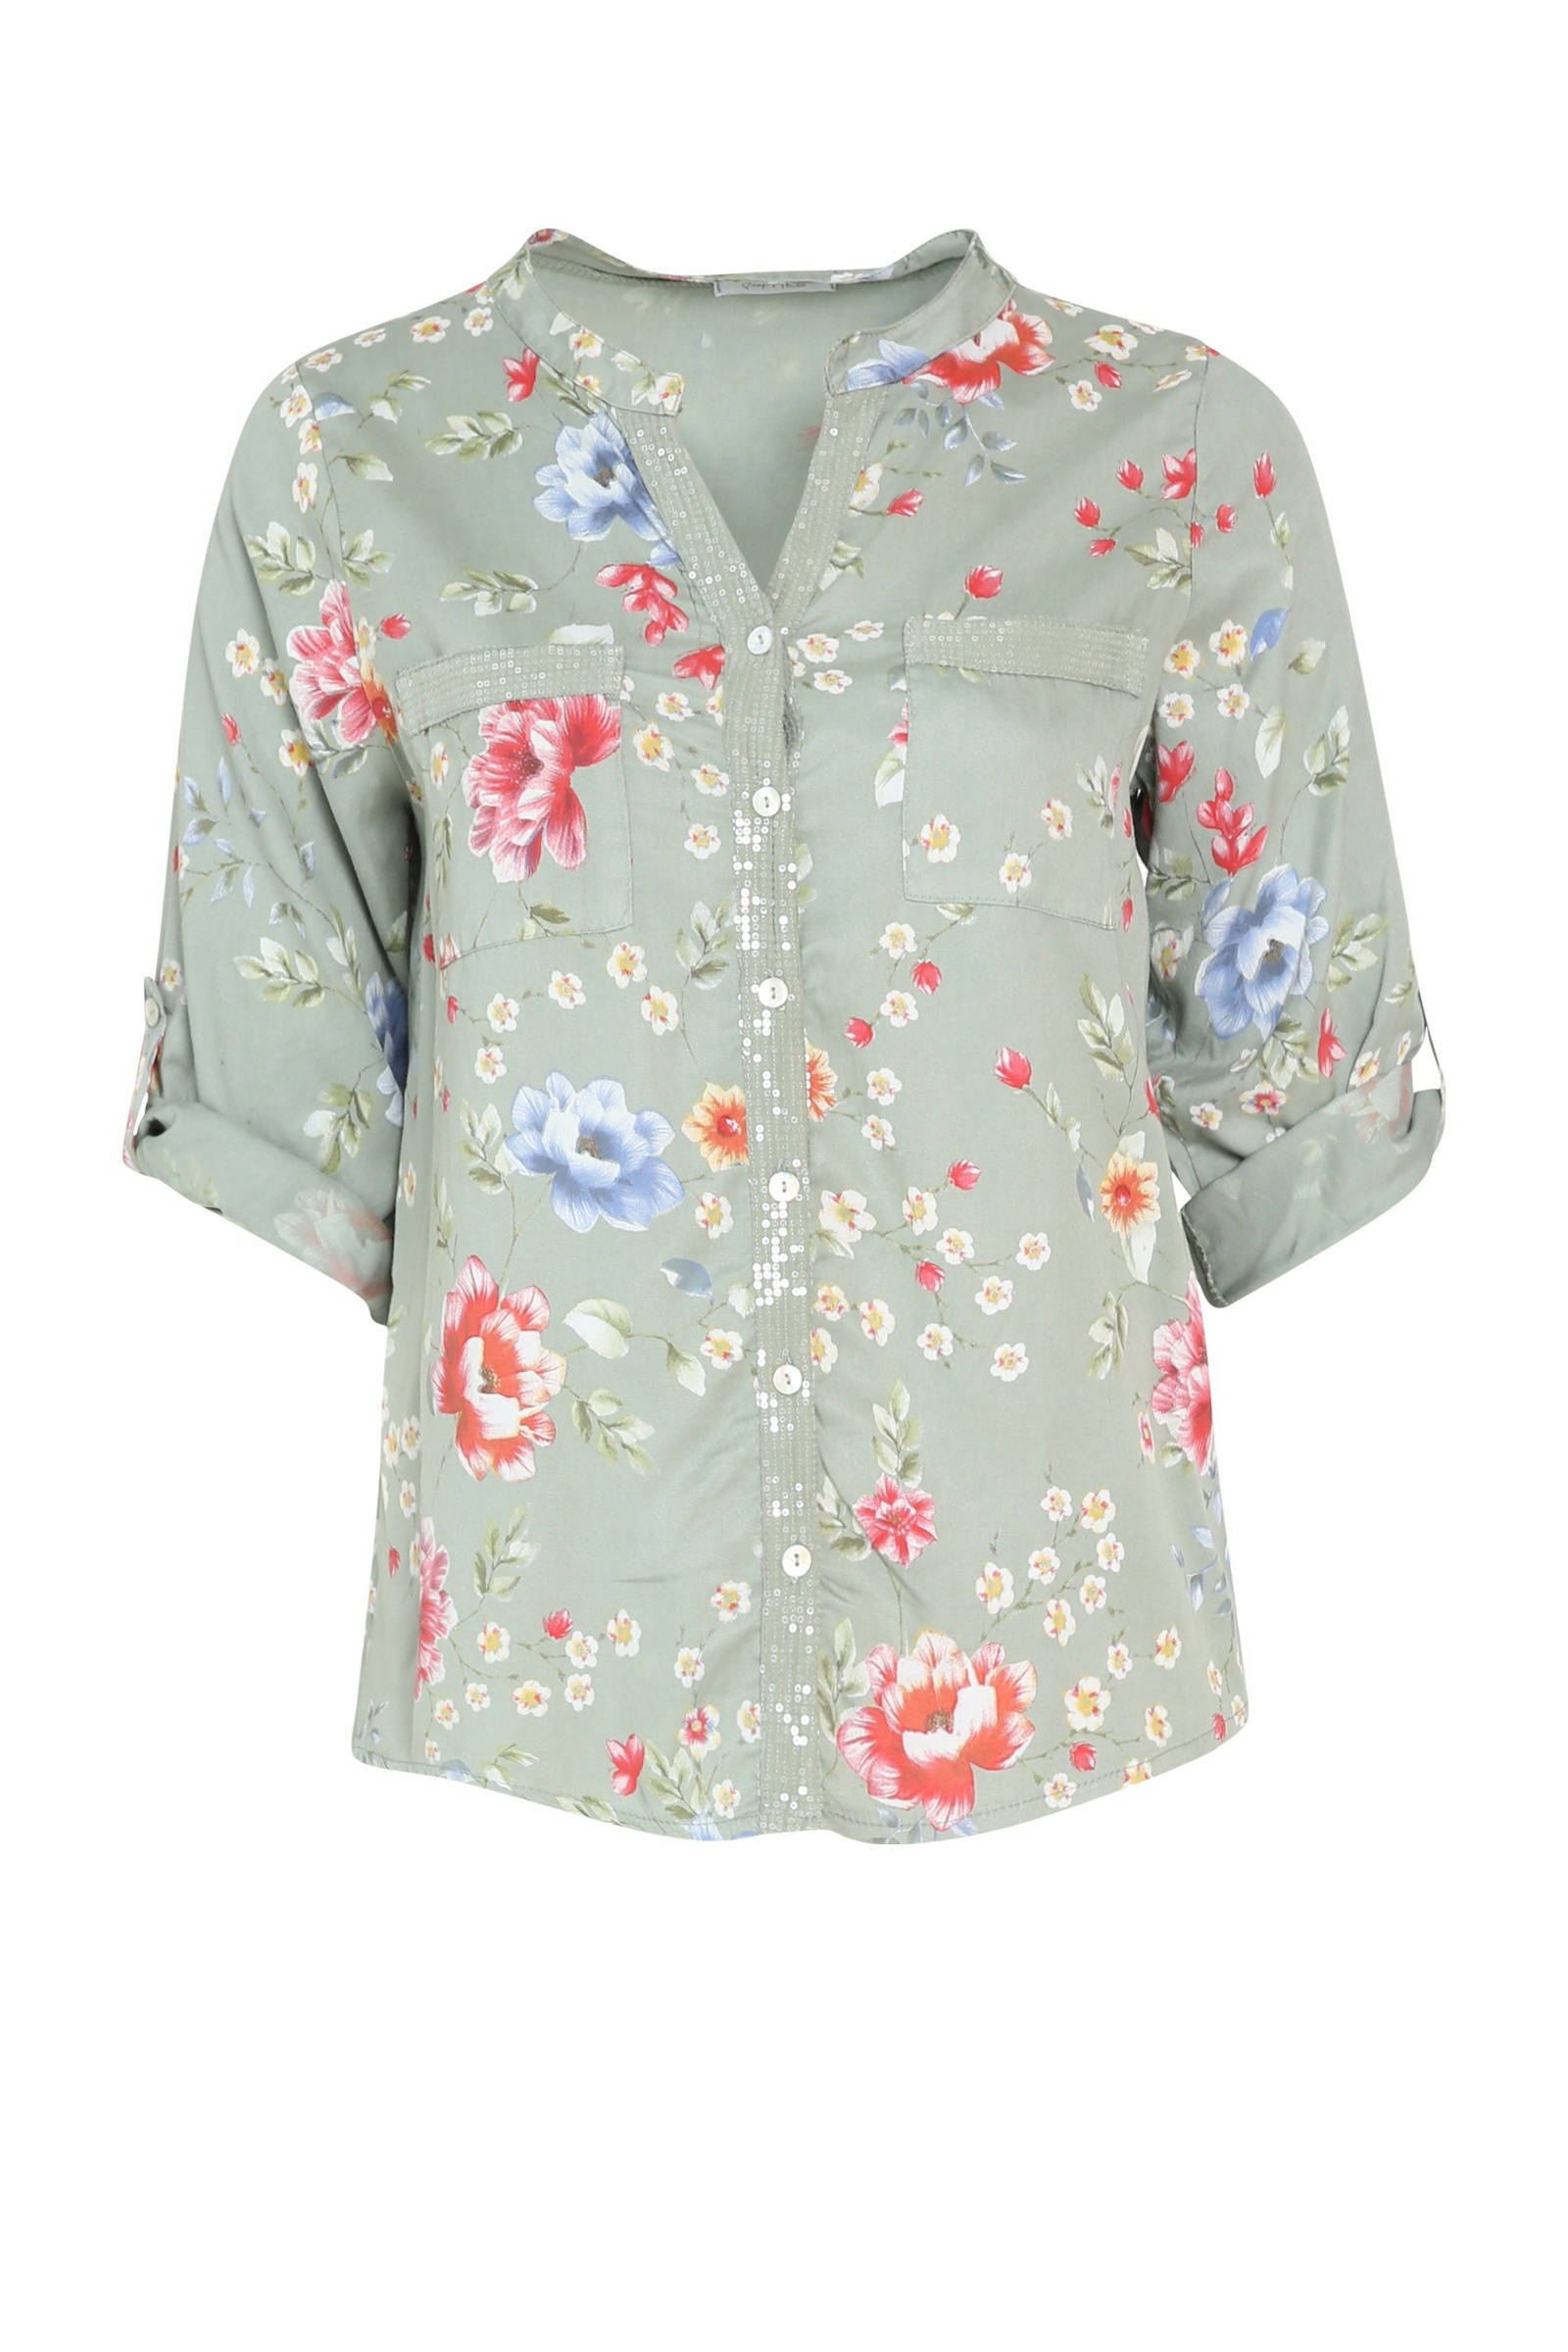 Paprika gebloemde blouse marinegroenroze | wehkamp